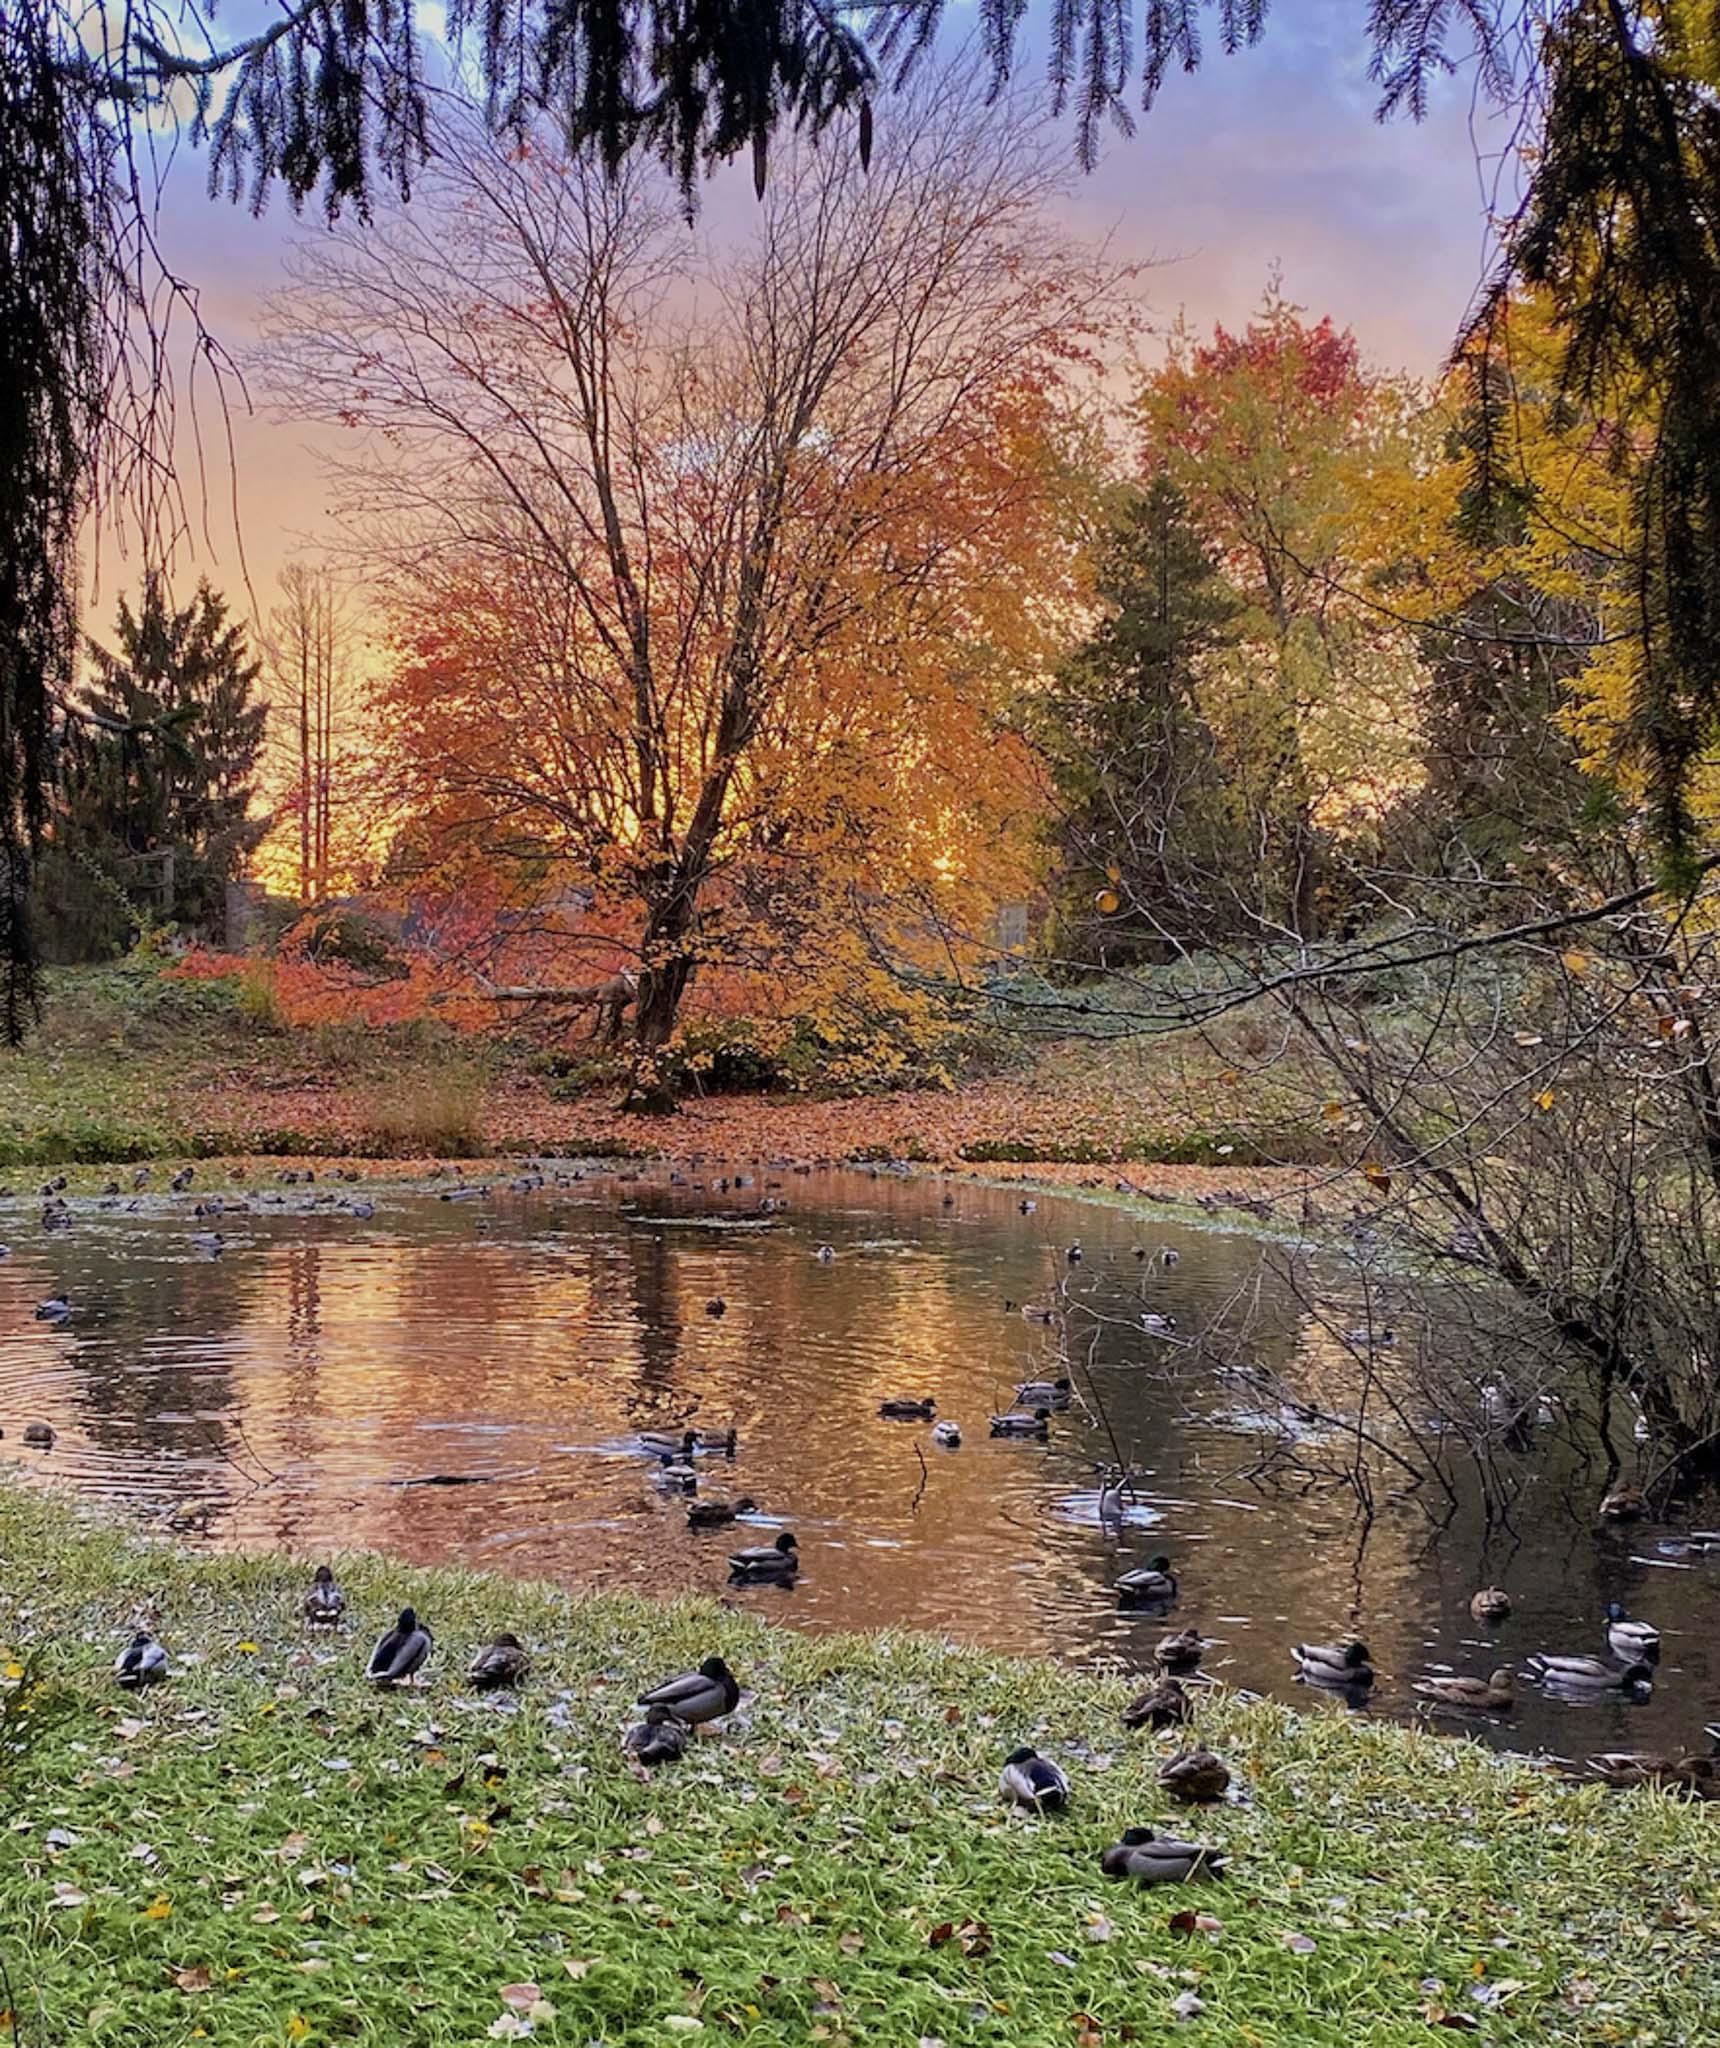 CarolJJ-The Duck Pond